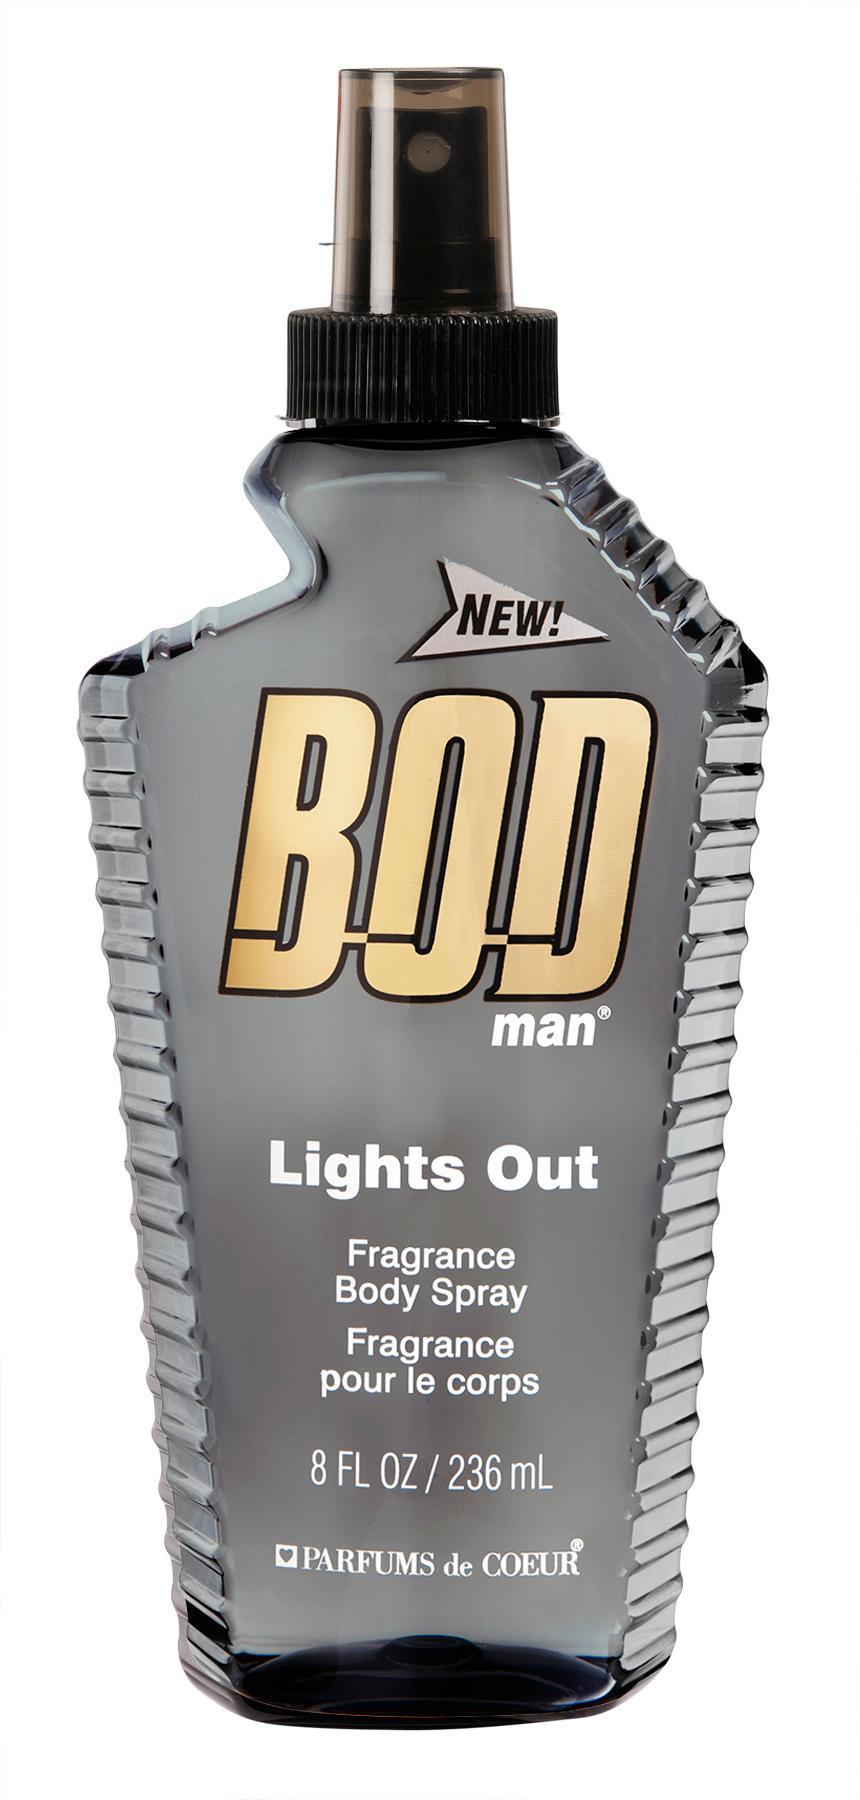 Bodman Lights Out Body Spray 236ml